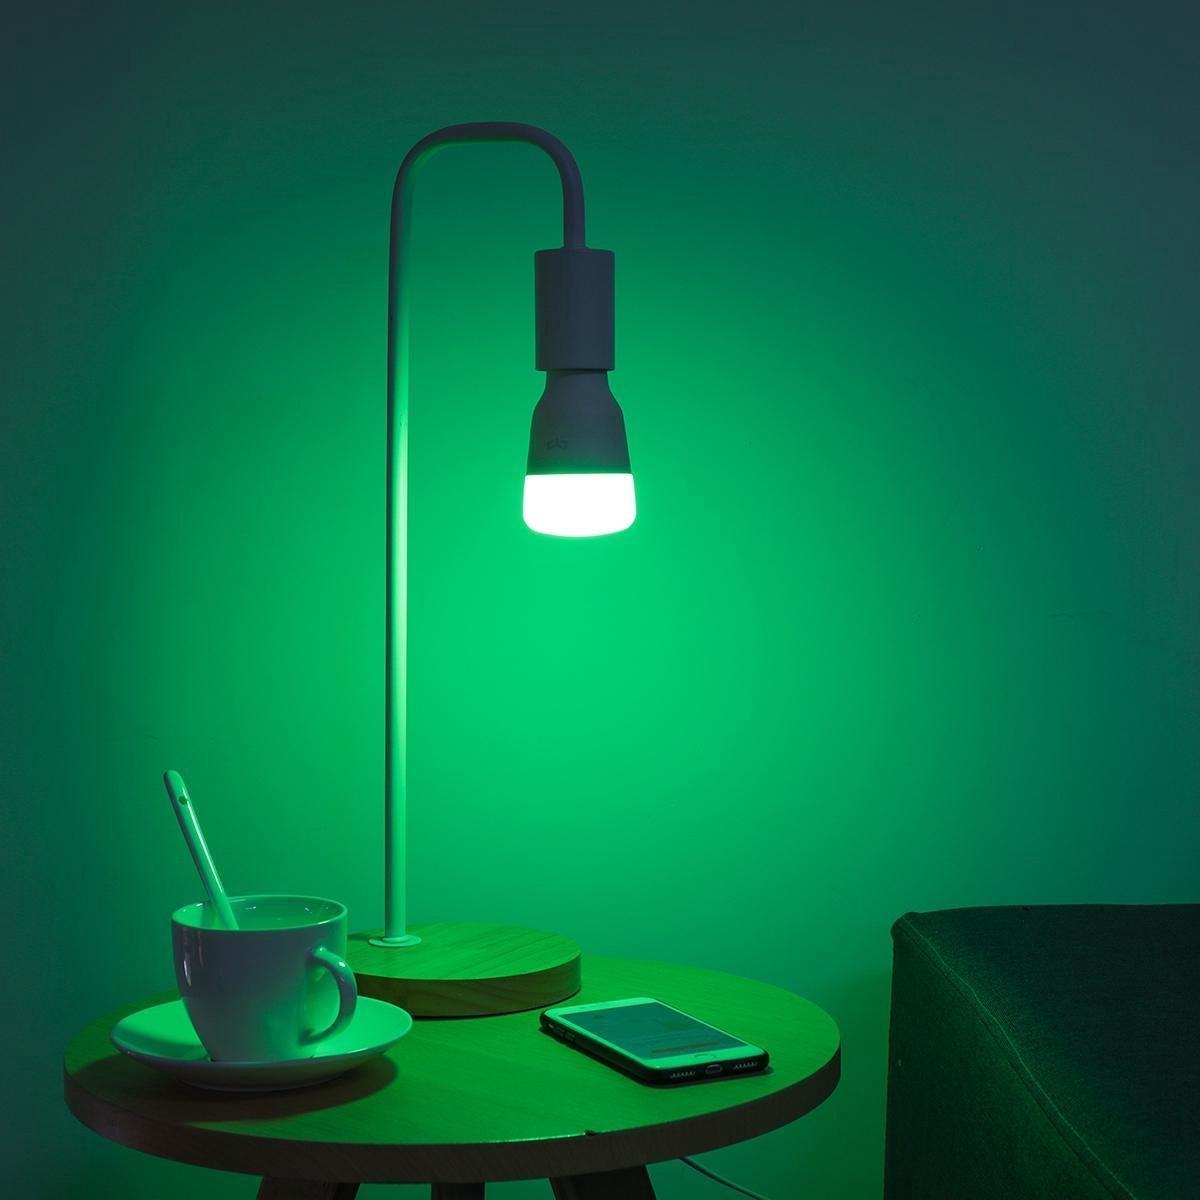 3 STKS Yeelight YLDP06YL E27 10 W RGBW Smart LED Lamp Werk Met Amazon Alexa AC100-240V (Xiaomi Ecosysteem Product)